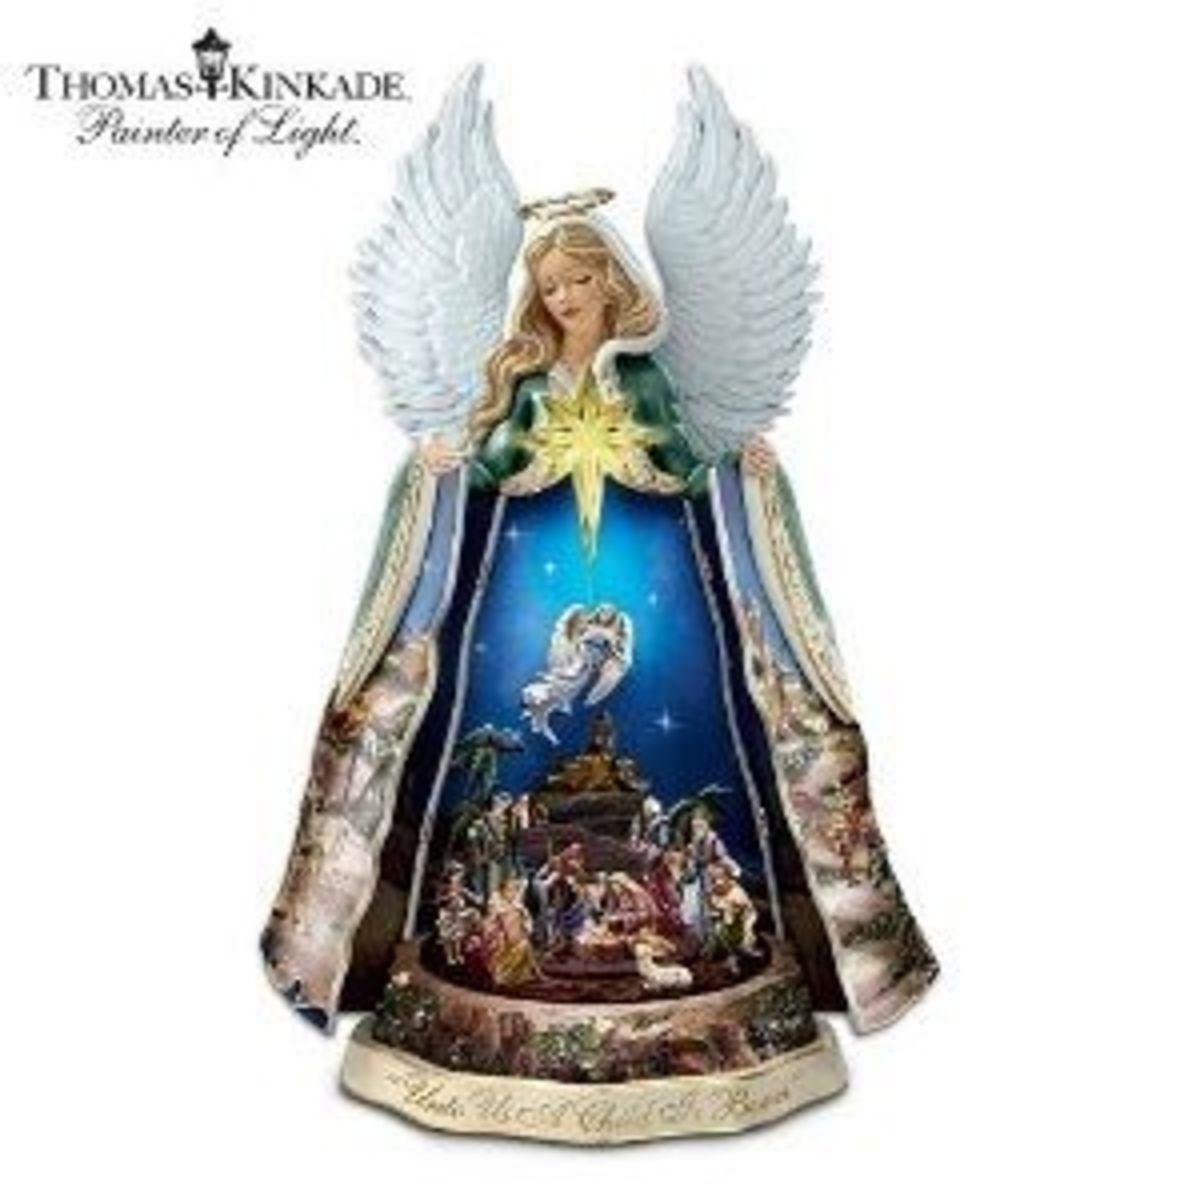 Thomas Kinkade Christmas Nativity Angel